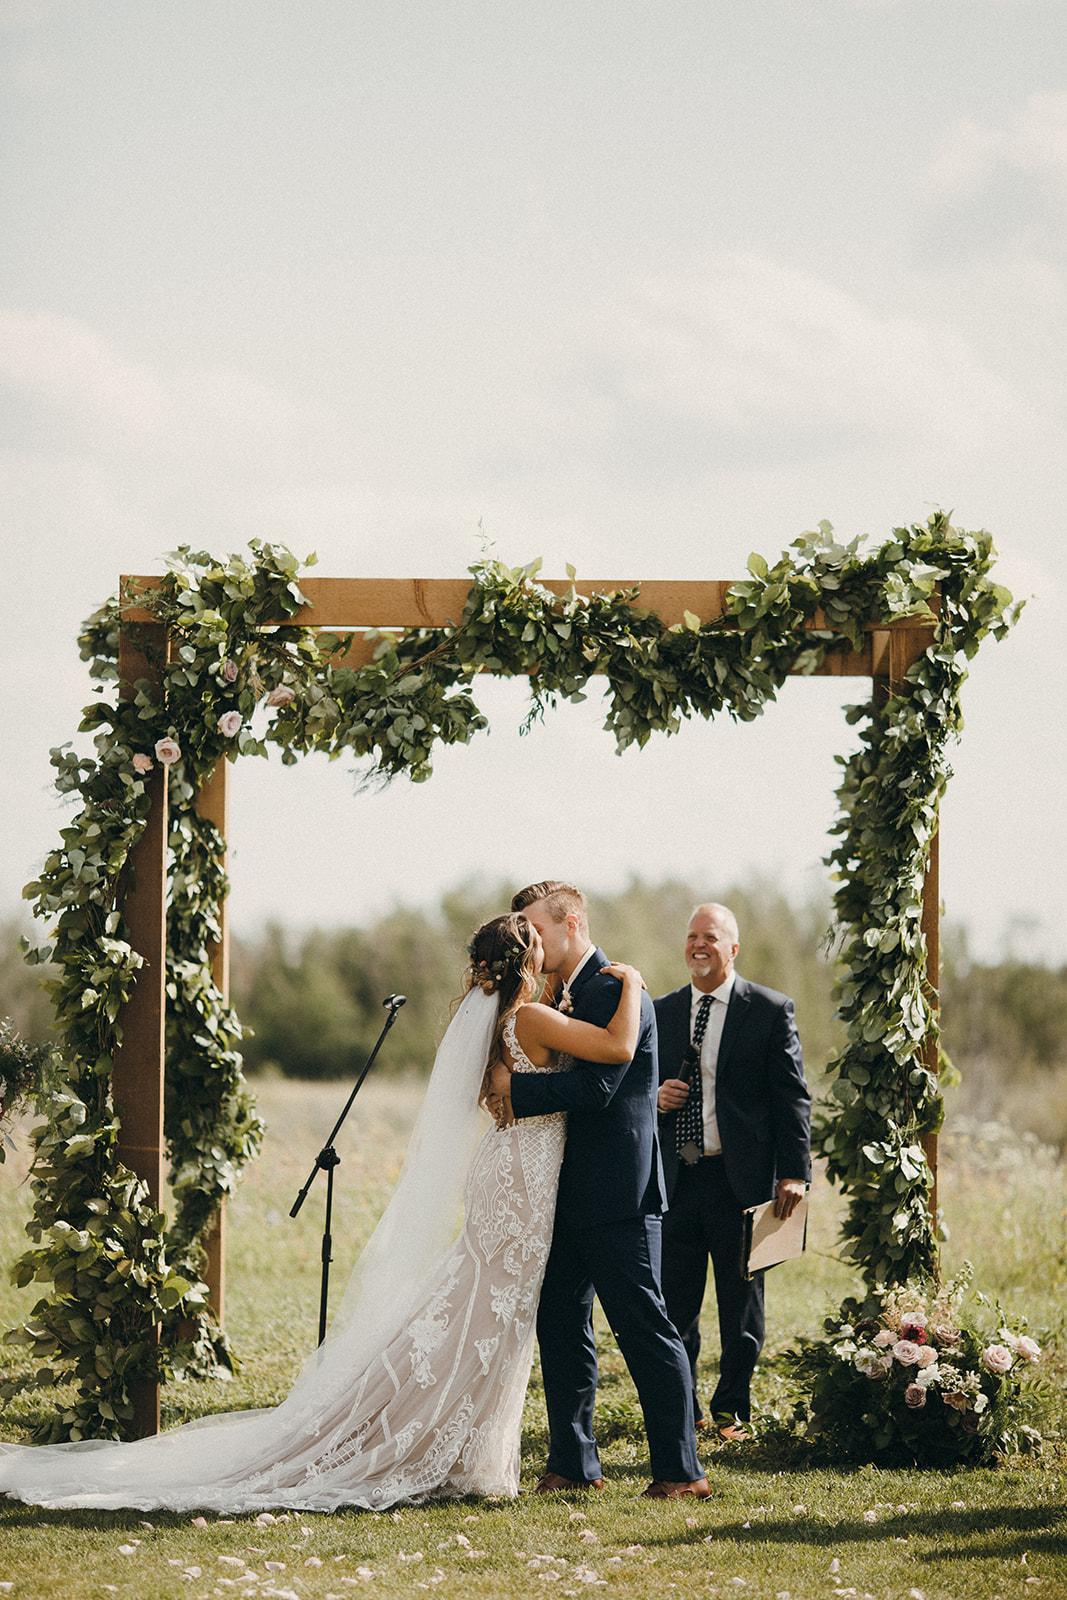 kaden_justine_wedding_3801.jpg